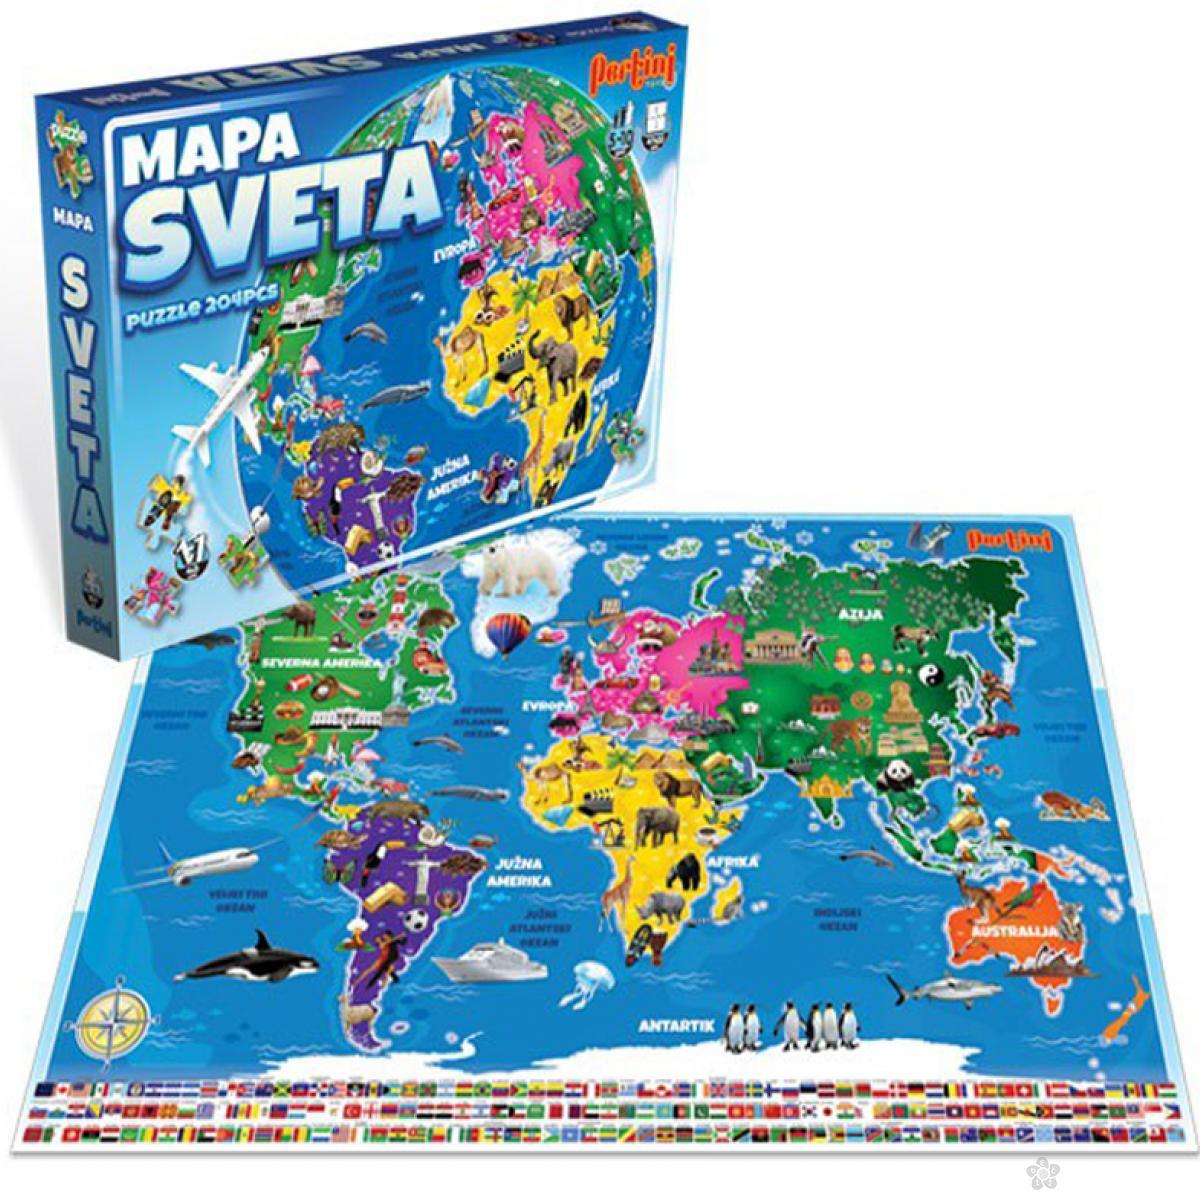 Puzzle Mapa sveta 204 elementa